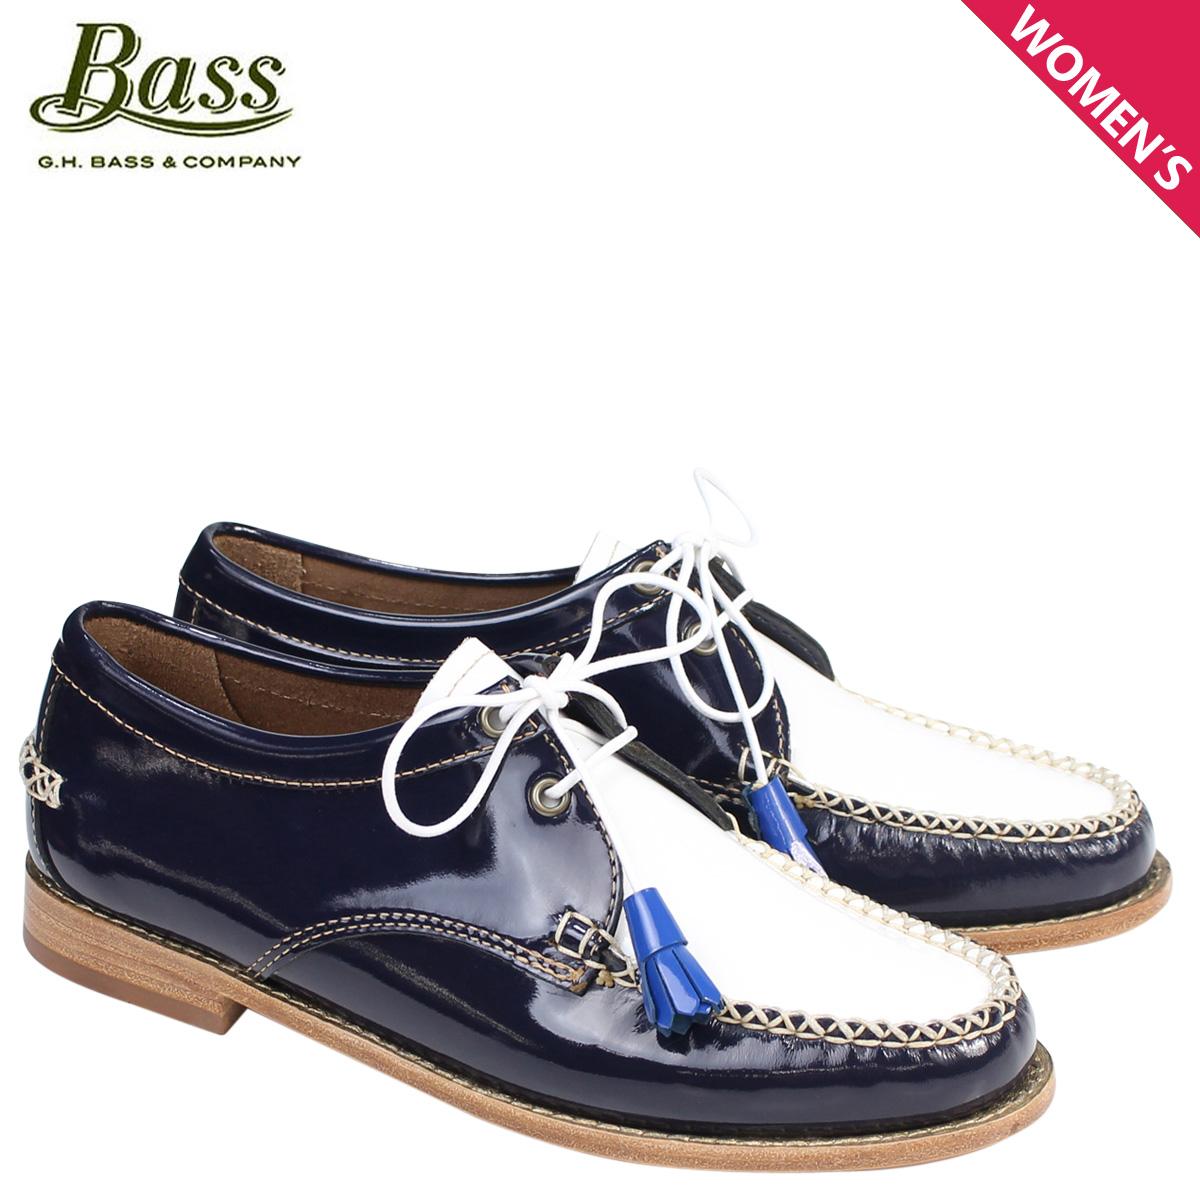 G.H. BASS ローファー ジーエイチバス レディース タッセル WINNIE TIE WEEJUNS 71-22875 靴 ネイビー ホワイト